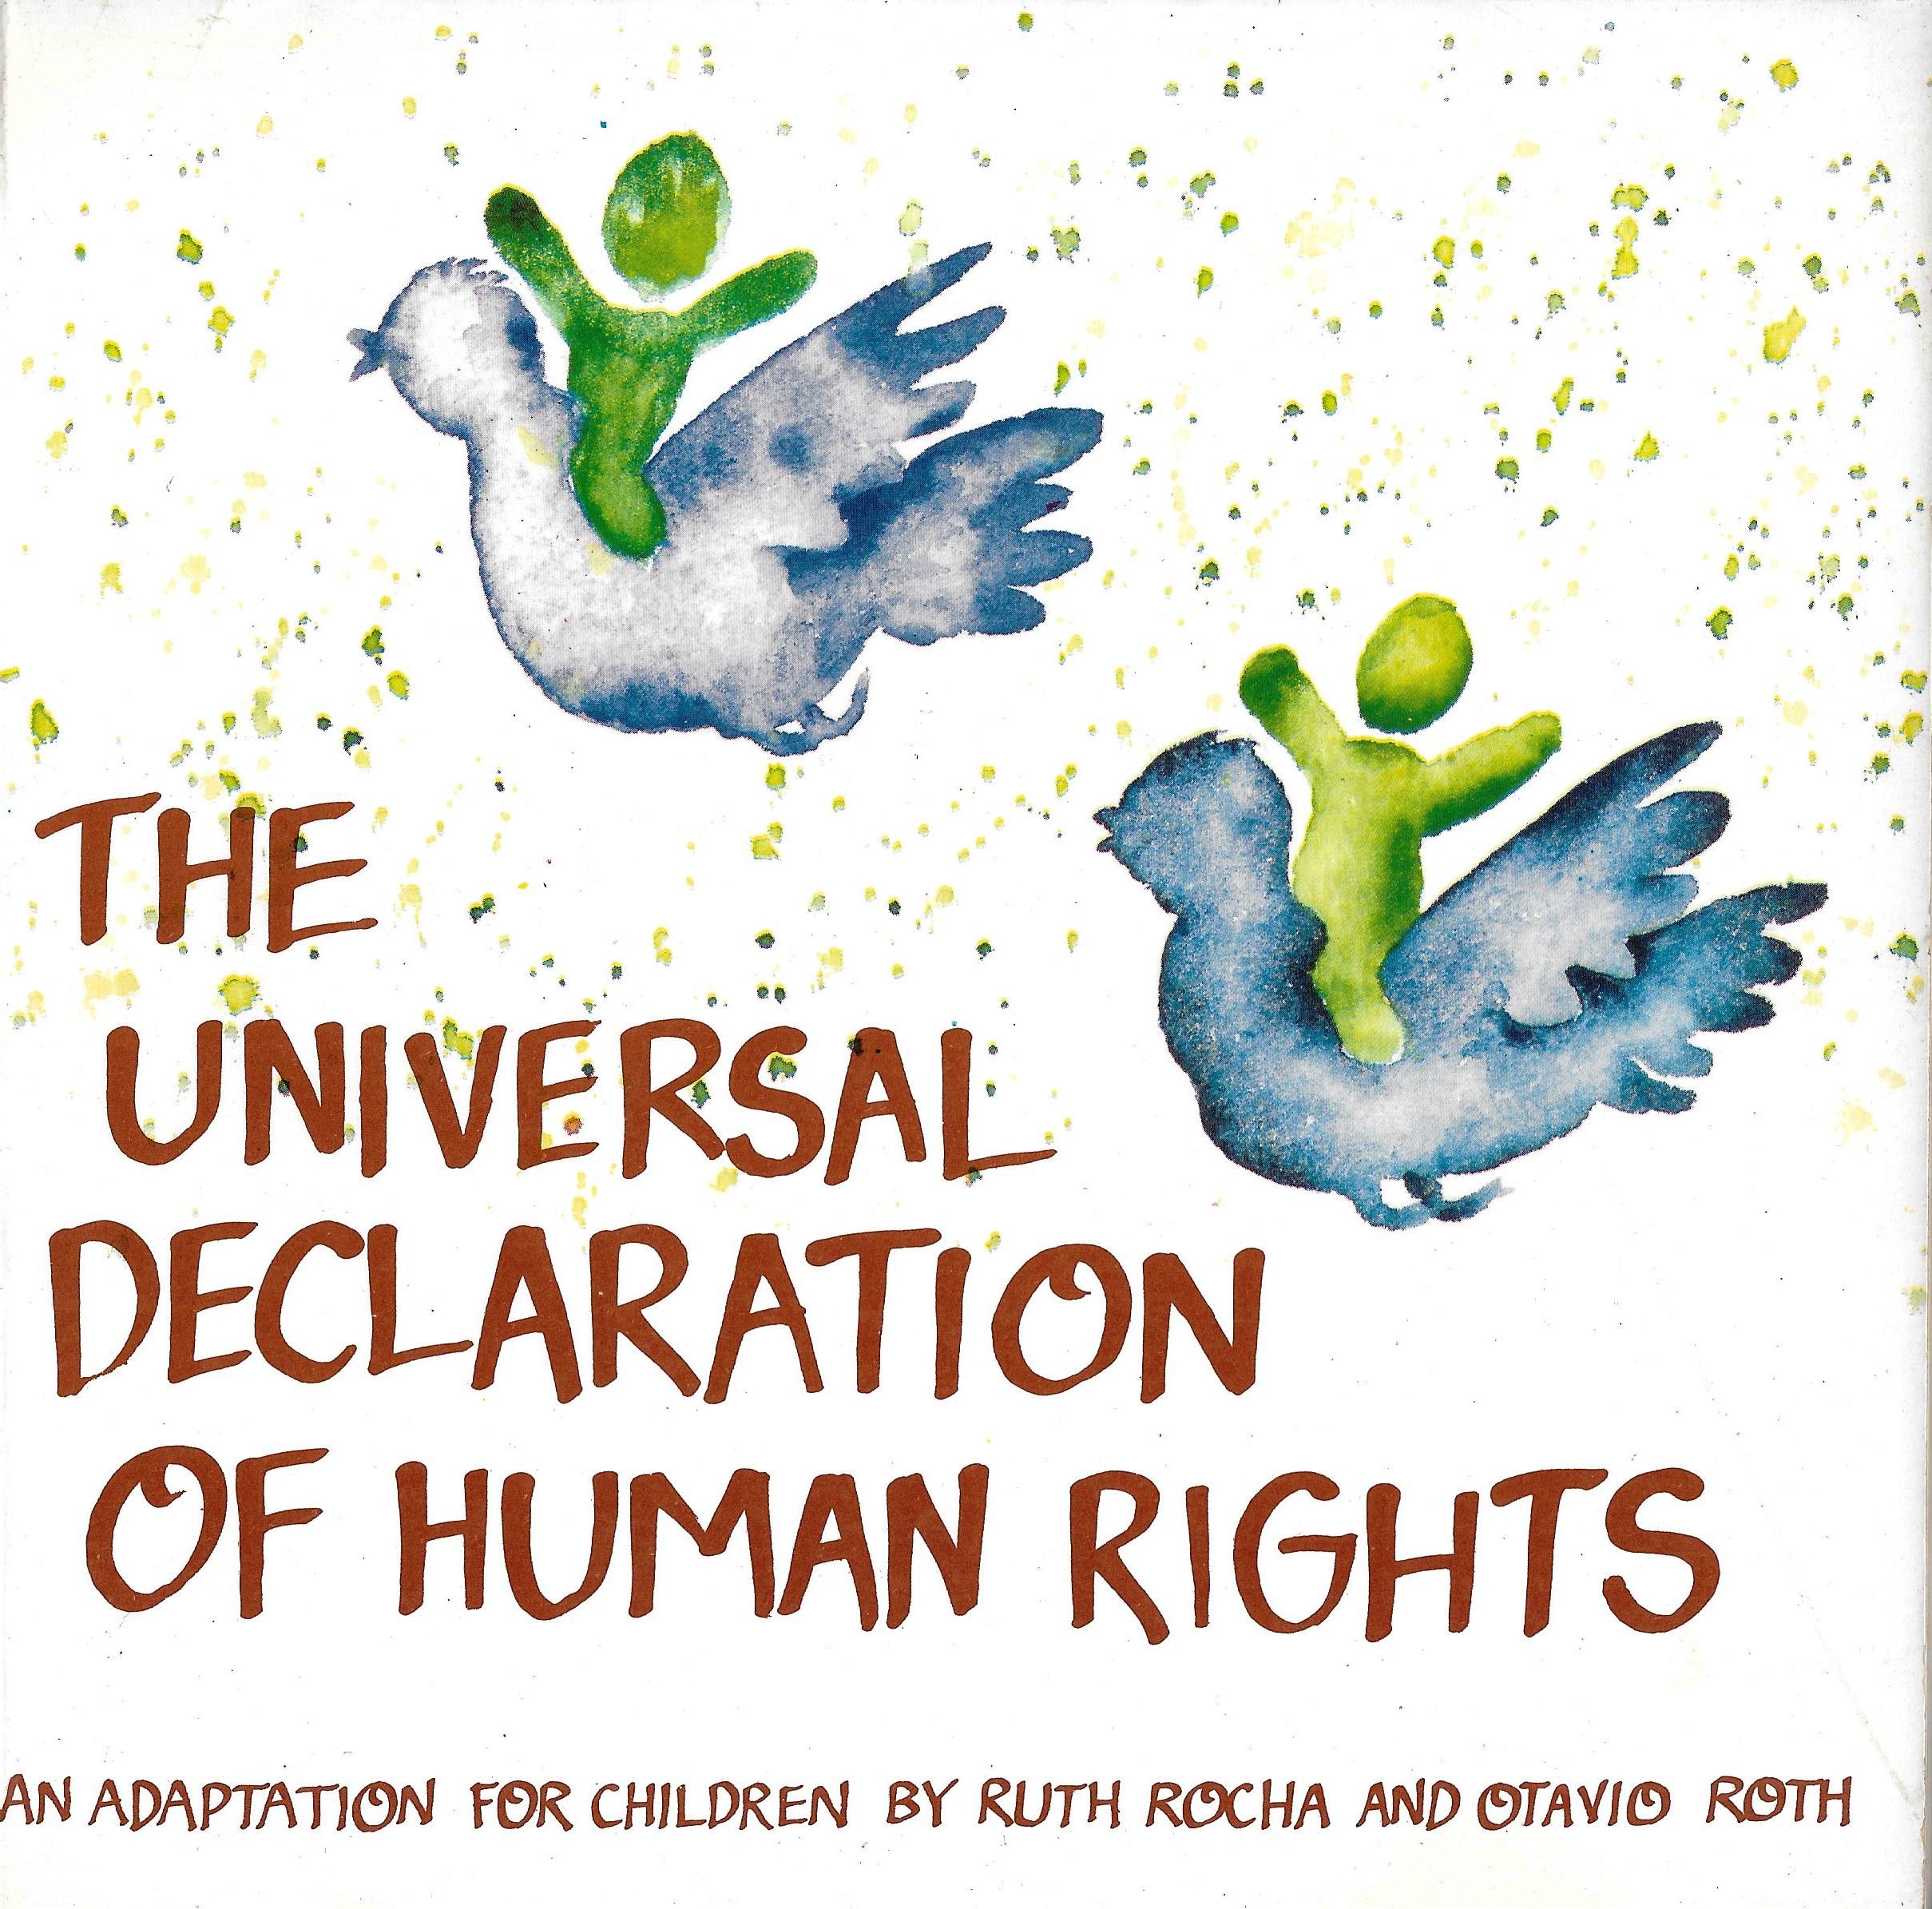 The Universal Declaration